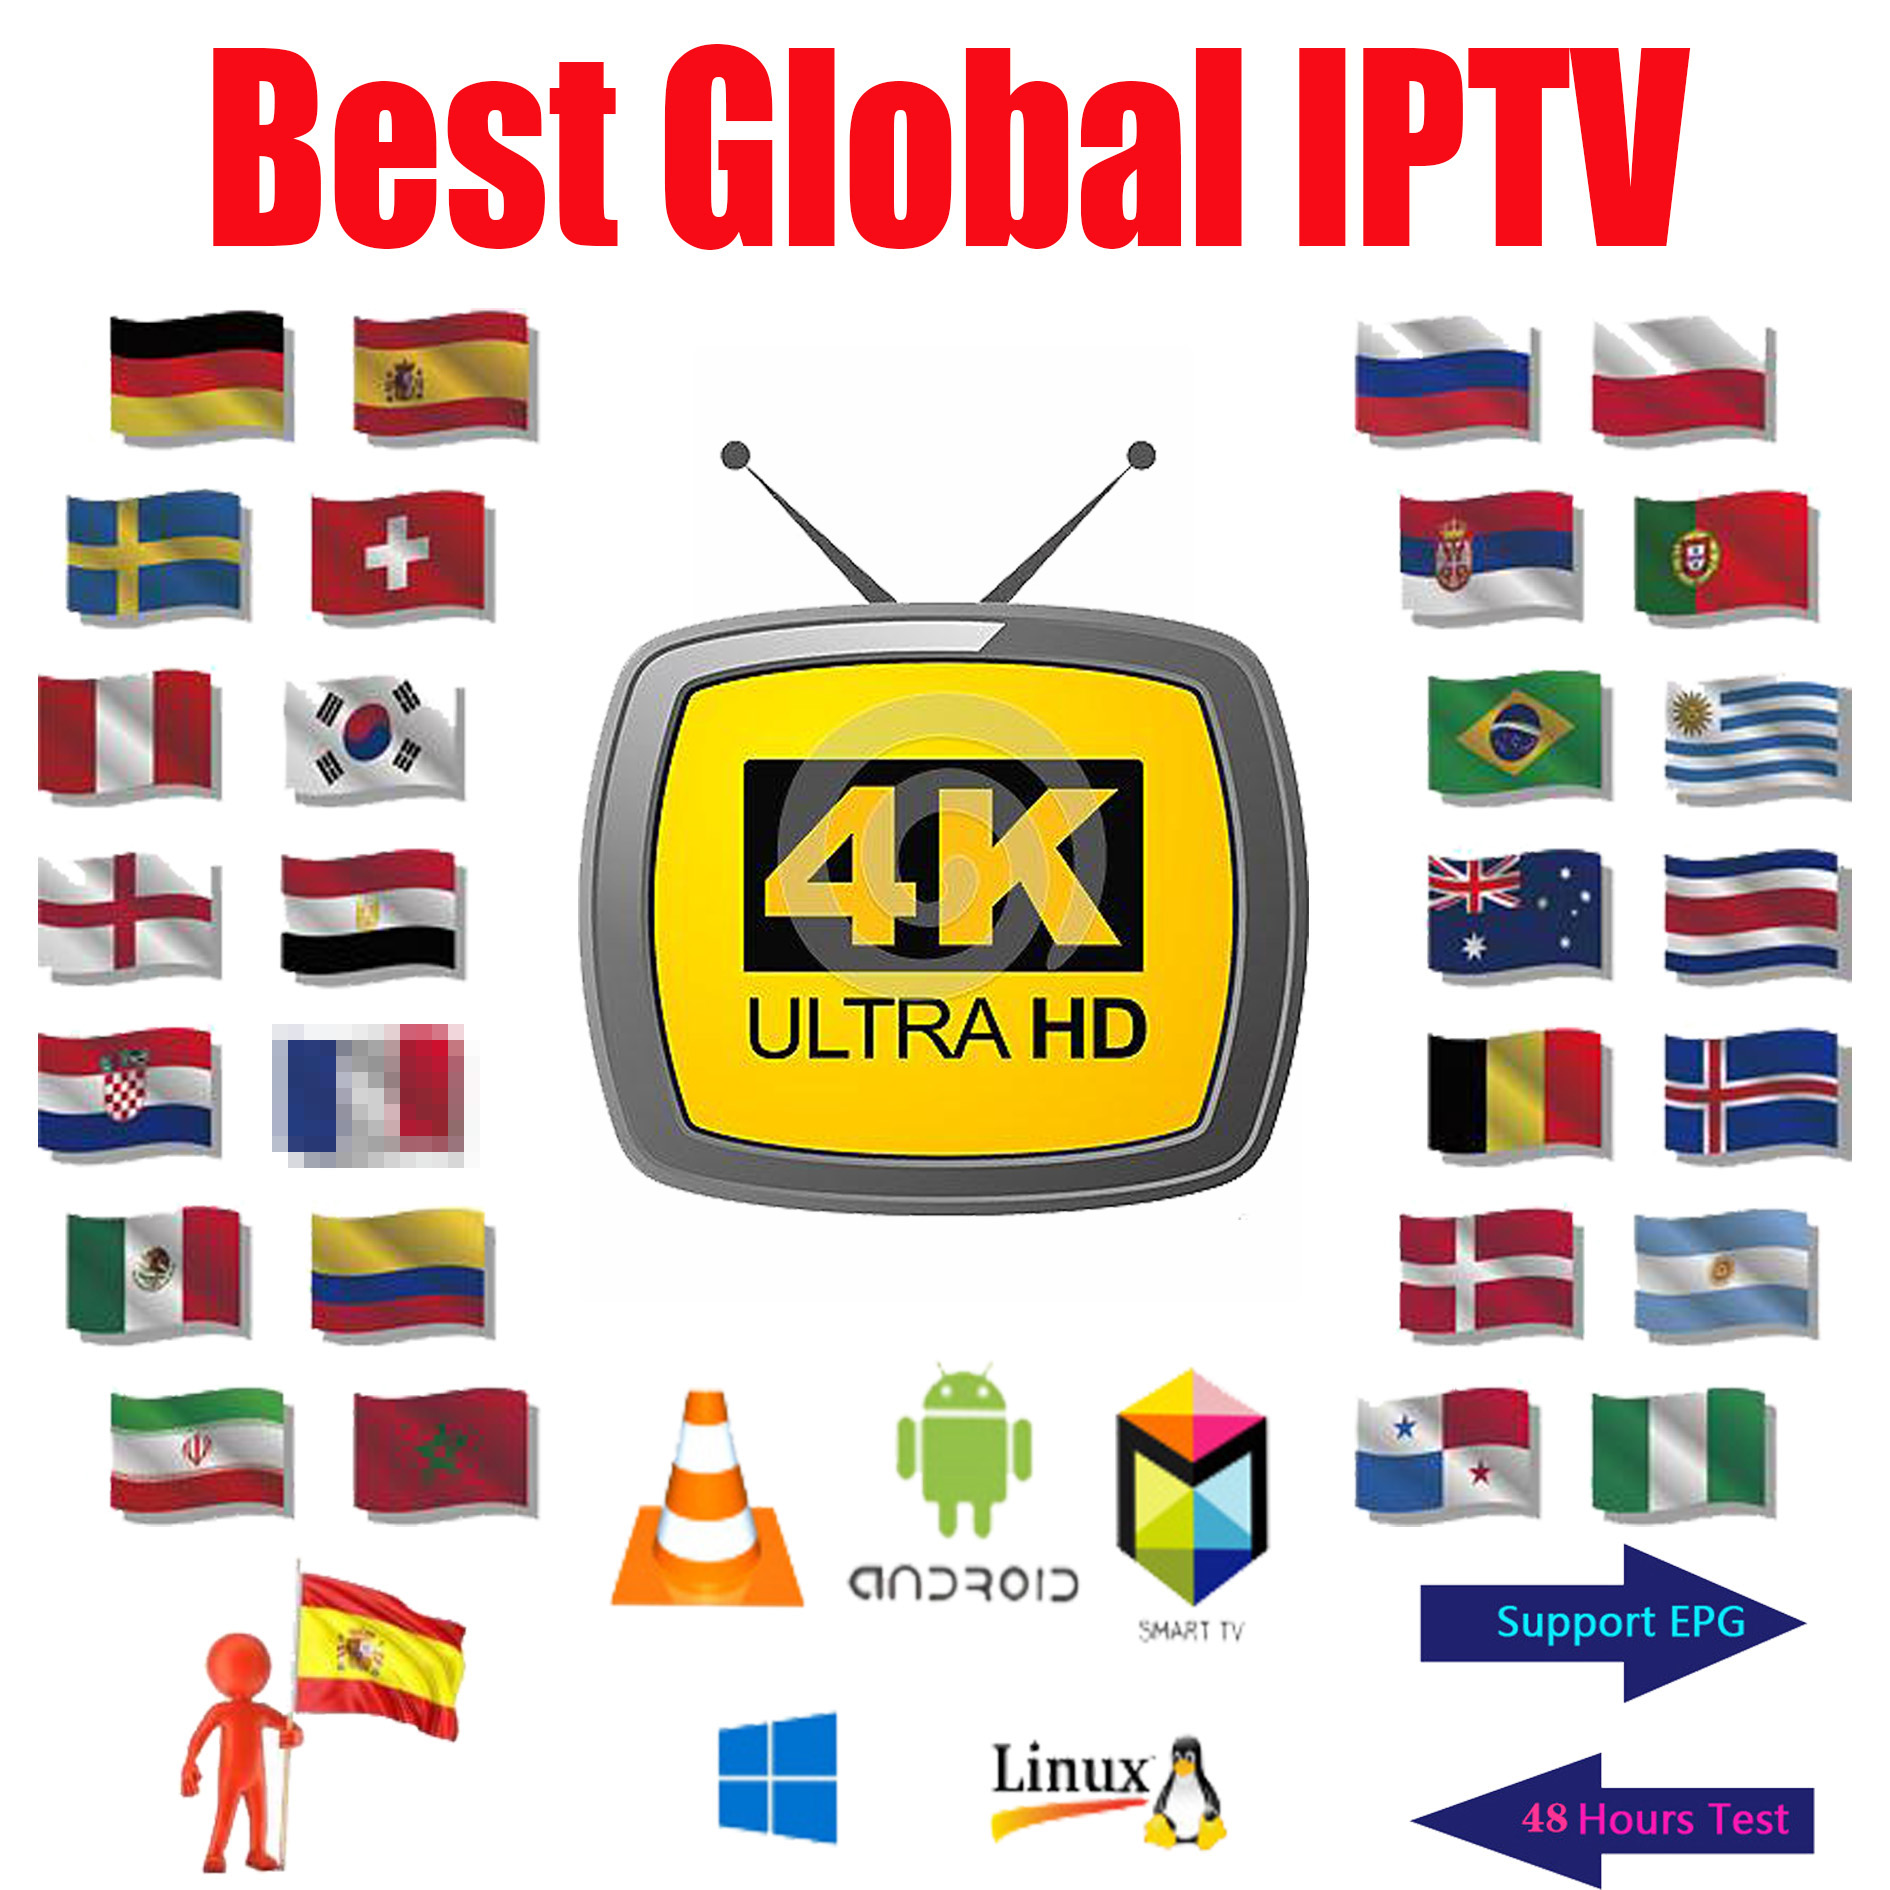 IPTV Xxx Channels TV Box Europe Sweden Arabic Spain  Italy Swisss Iptv Subscription UK Adult Iptv M3u Ssmart TV Ma9 Tv Box